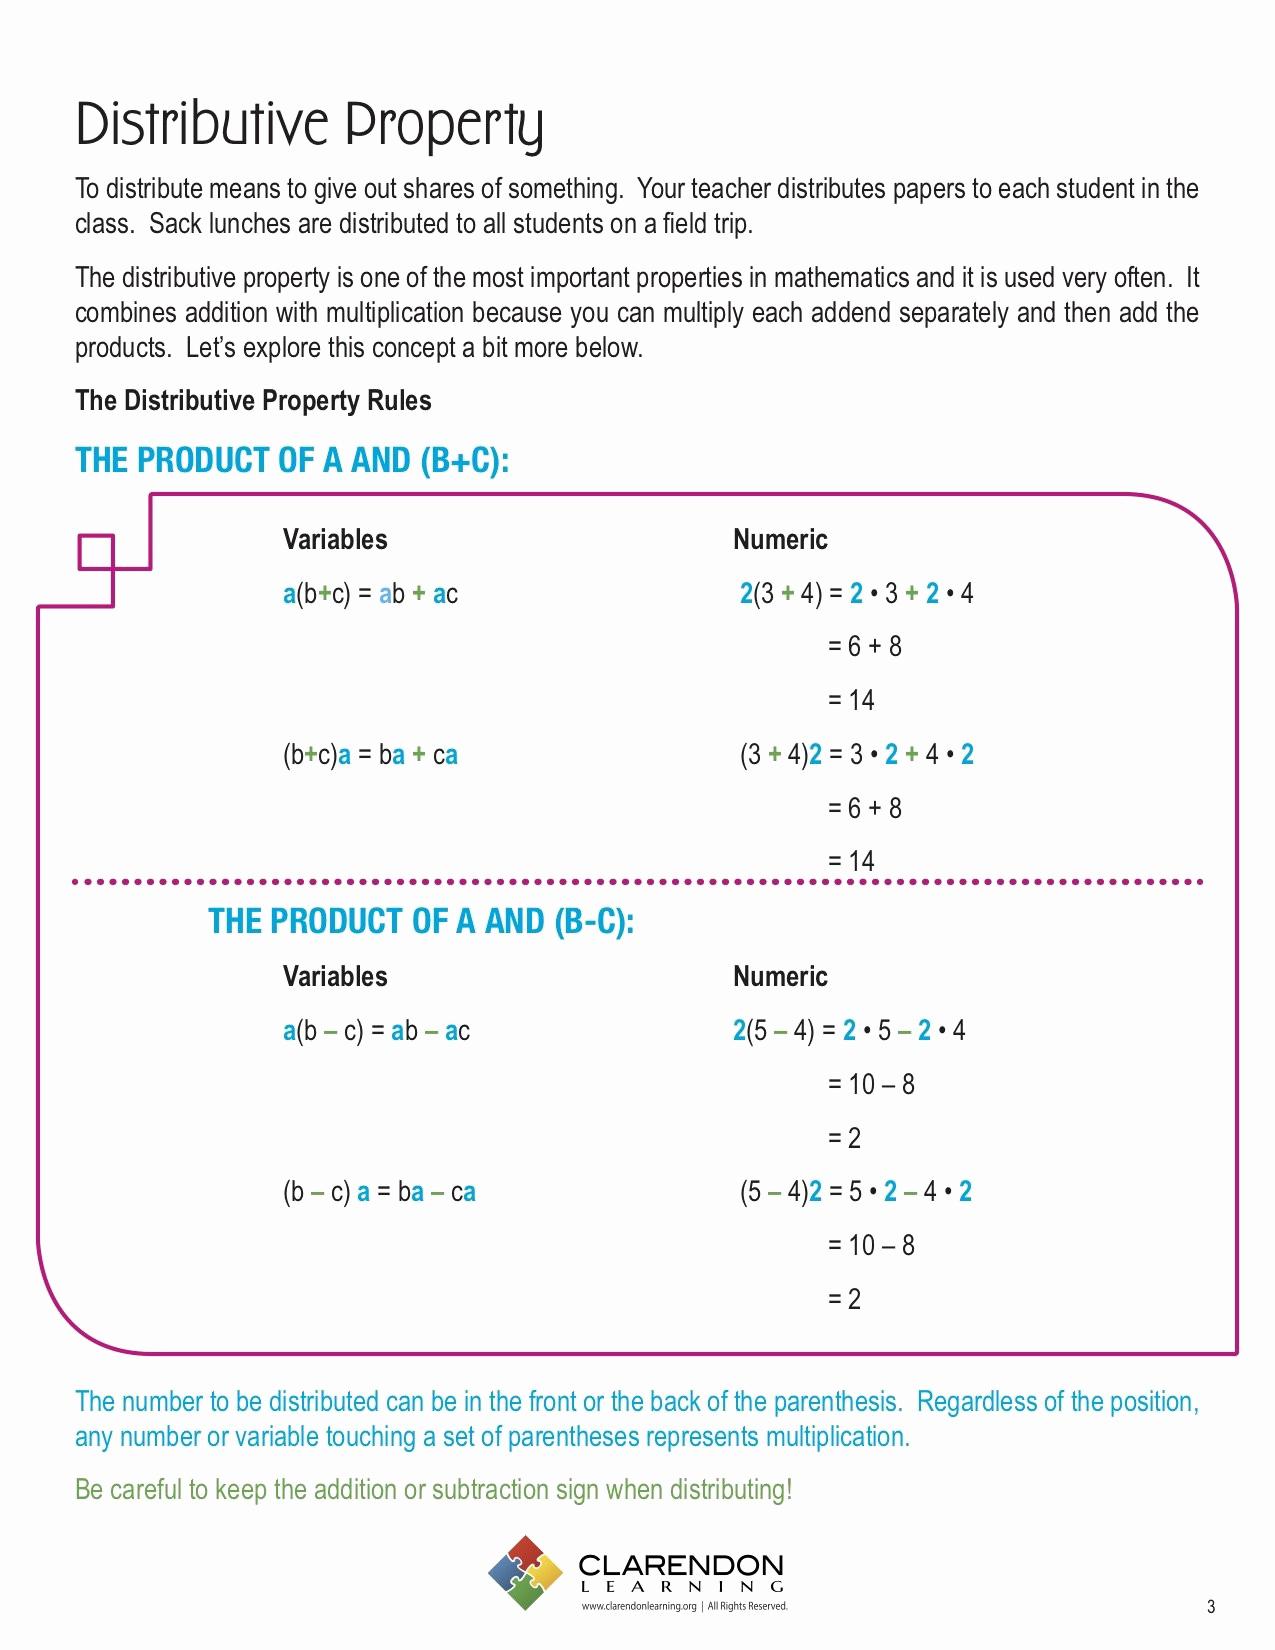 3rd Grade Distributive Property Worksheets New 20 Distributive Property 3rd Grade Worksheets